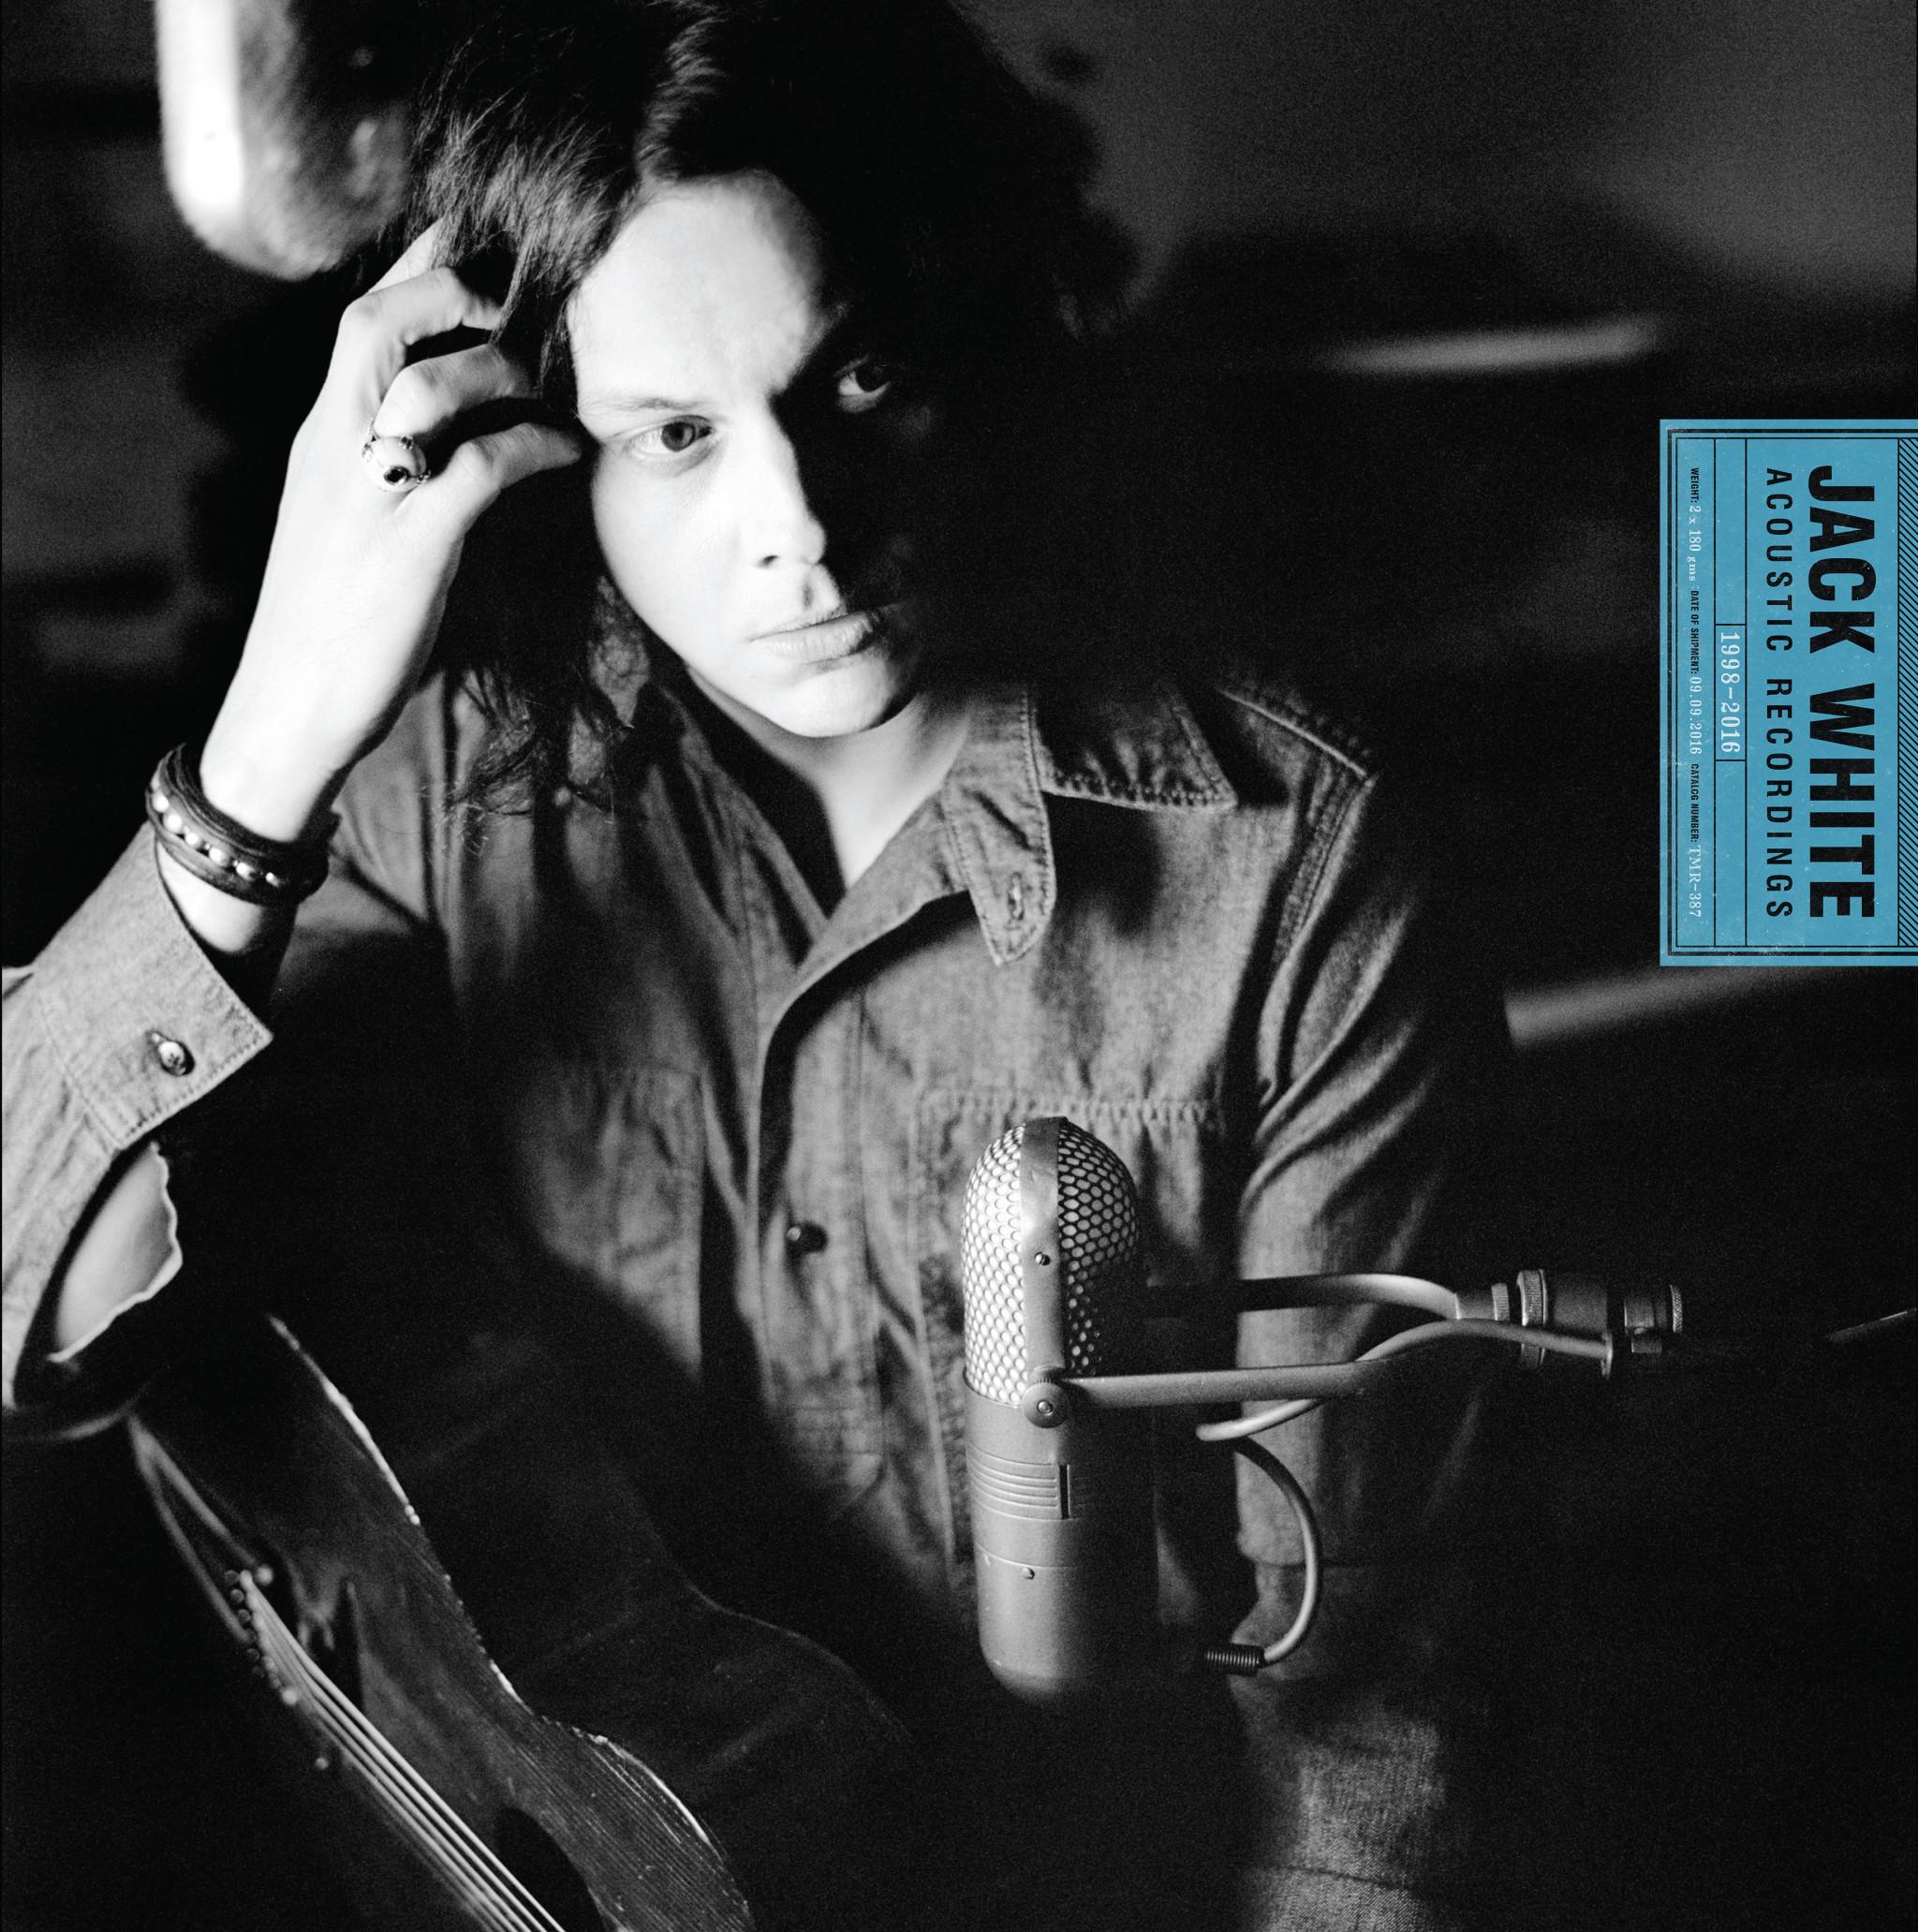 Jack White: Acoustic recordings 1998-2016